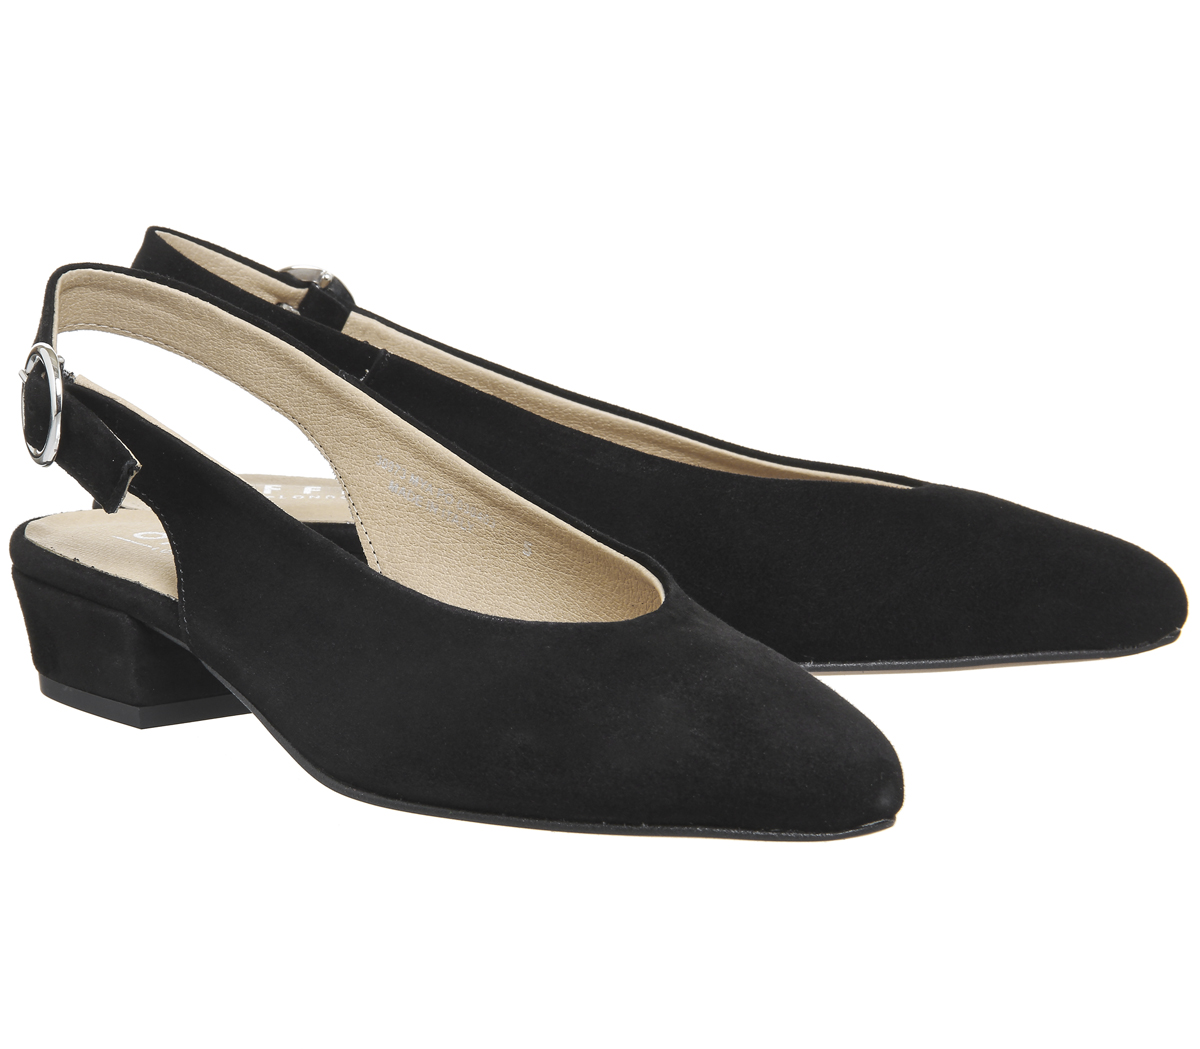 Damenschuhe Office Mya Mya Mya Slingback Block Heels BLACK SUEDE Heels 3e2394